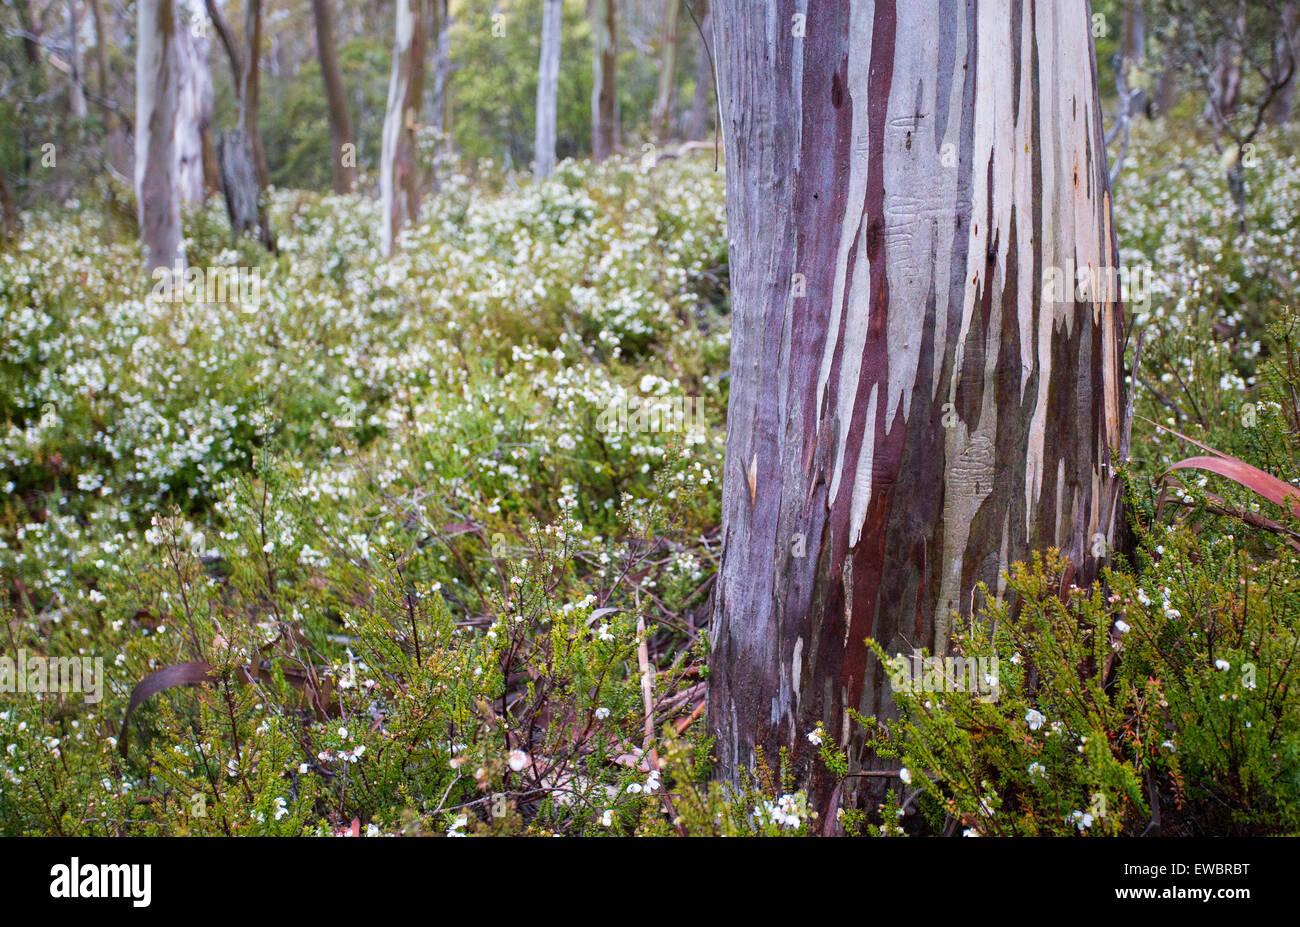 Bark patterns on a Snow Gum (Eucalyptus pauciflora), Mount Field National Park, Tasmania, Australia - Stock Image